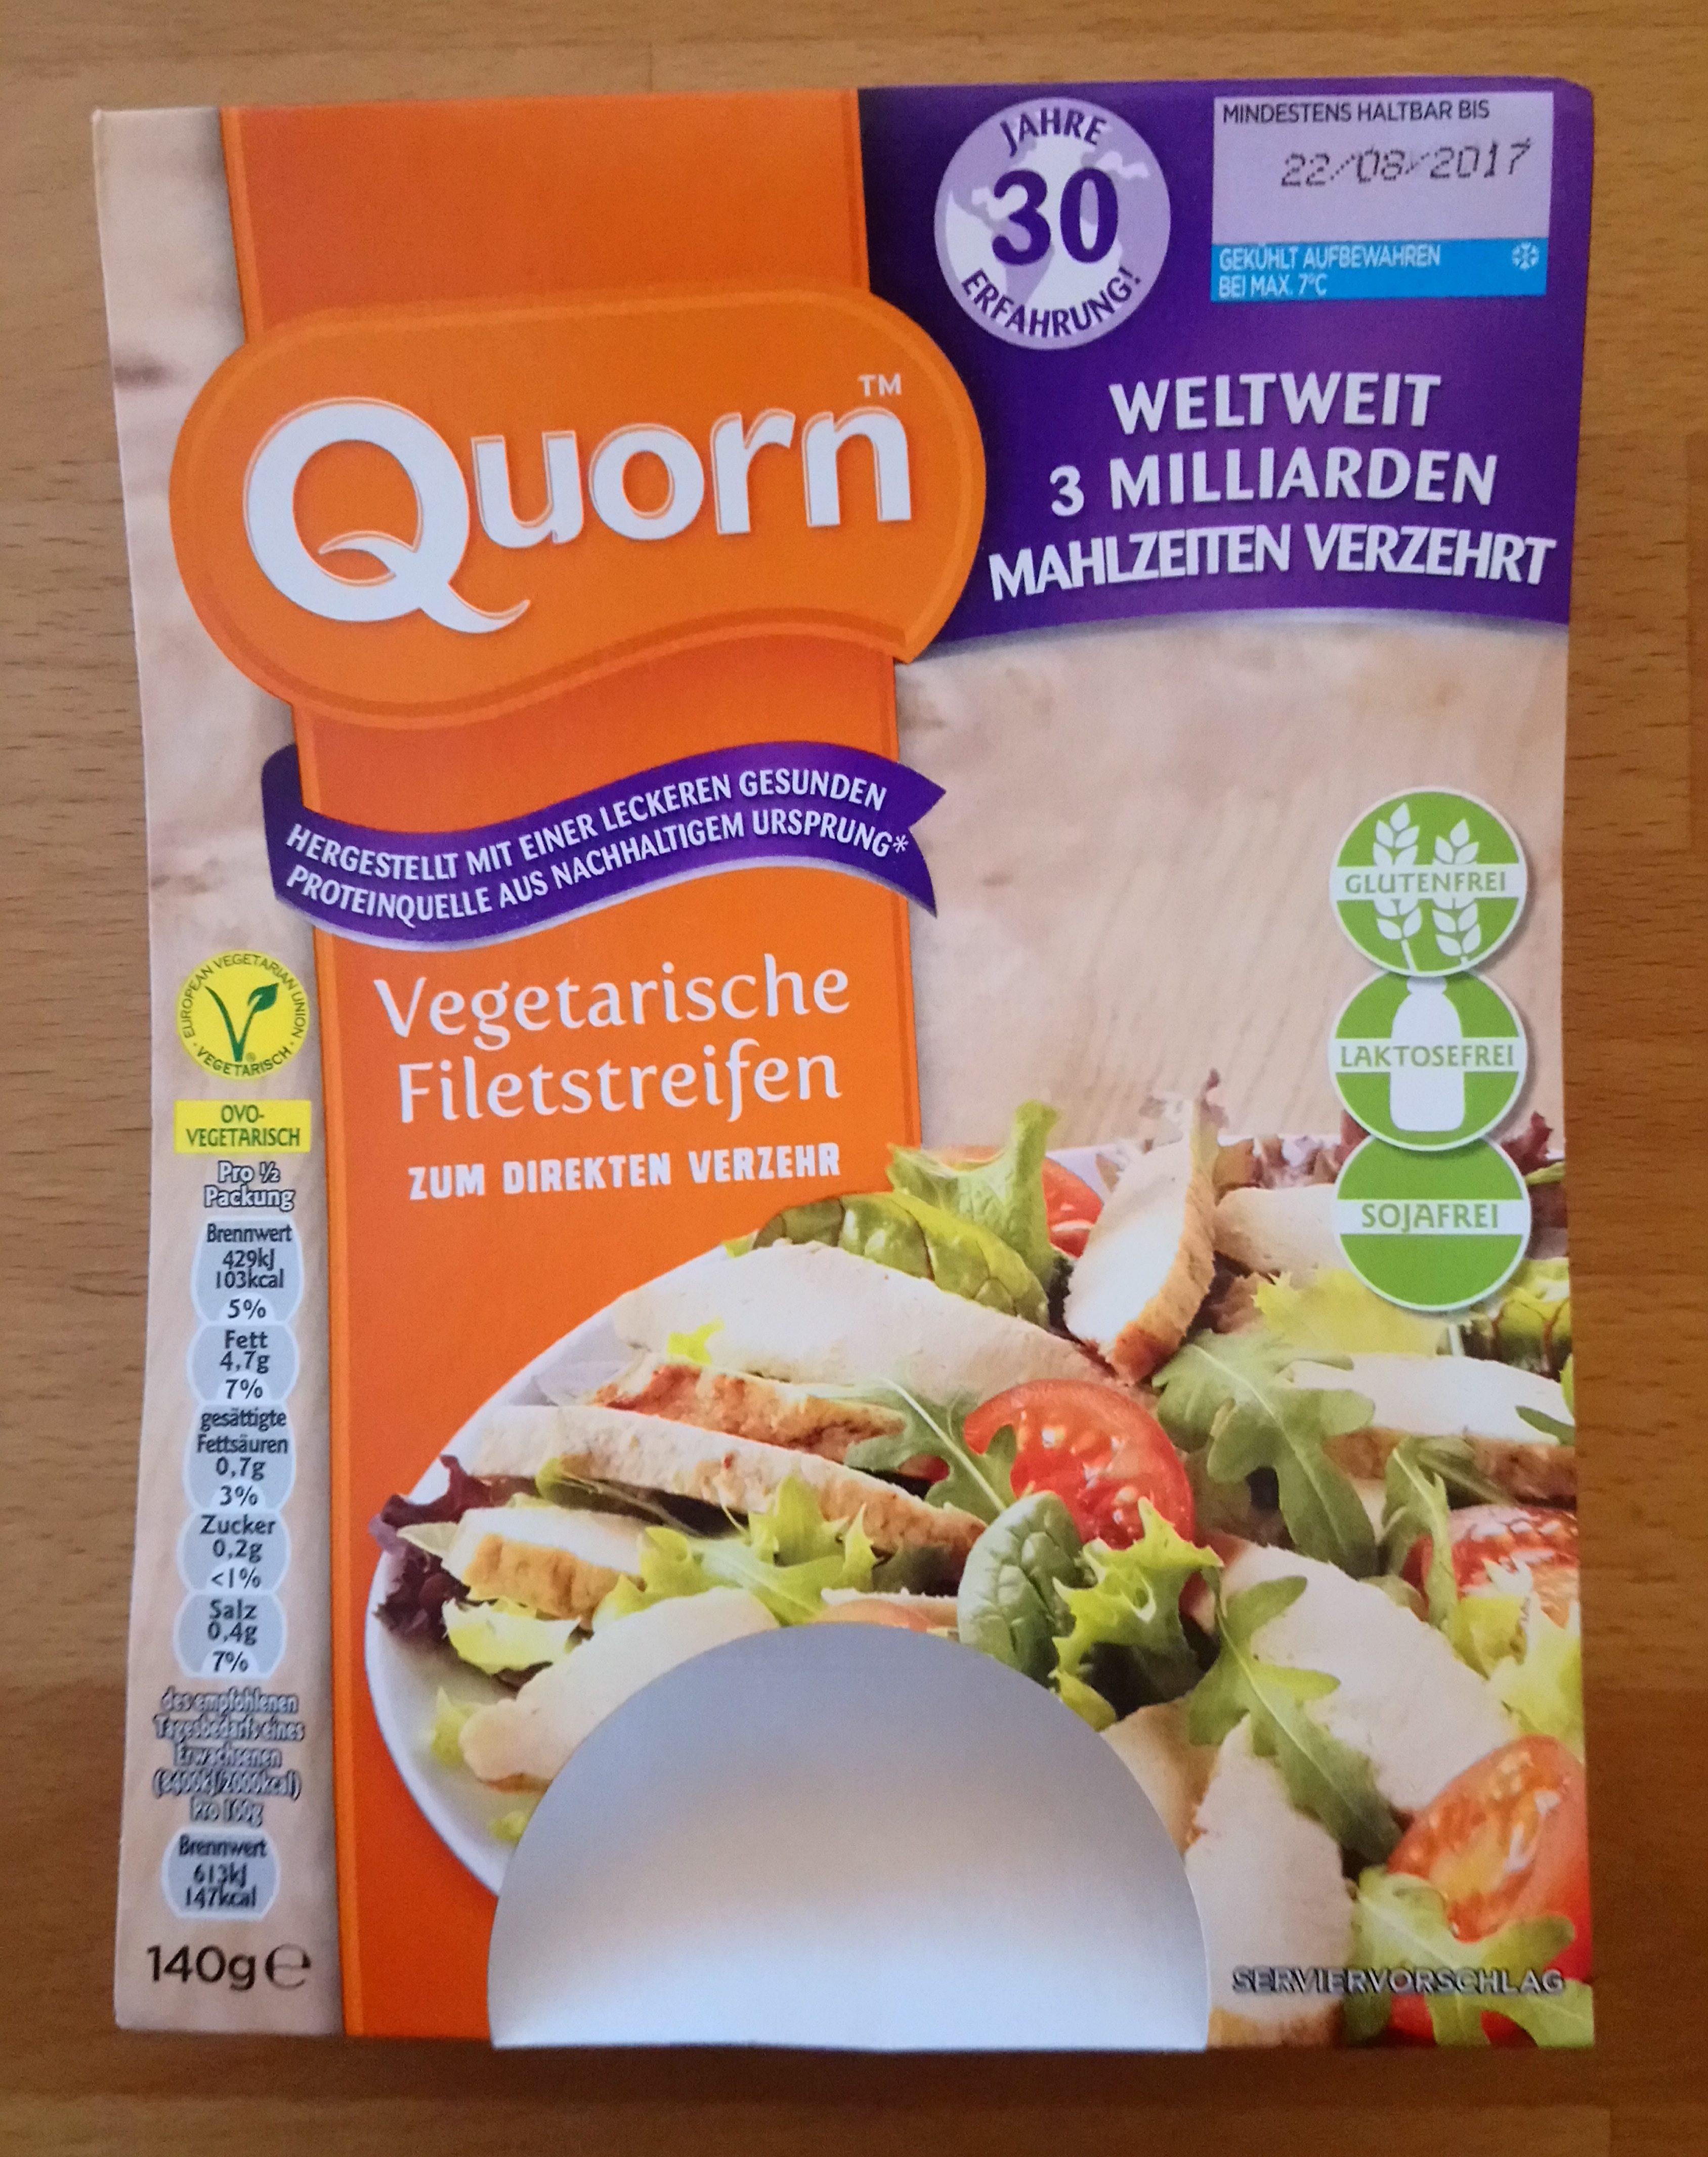 Vegetarische Filetstreifen - Produkt - de